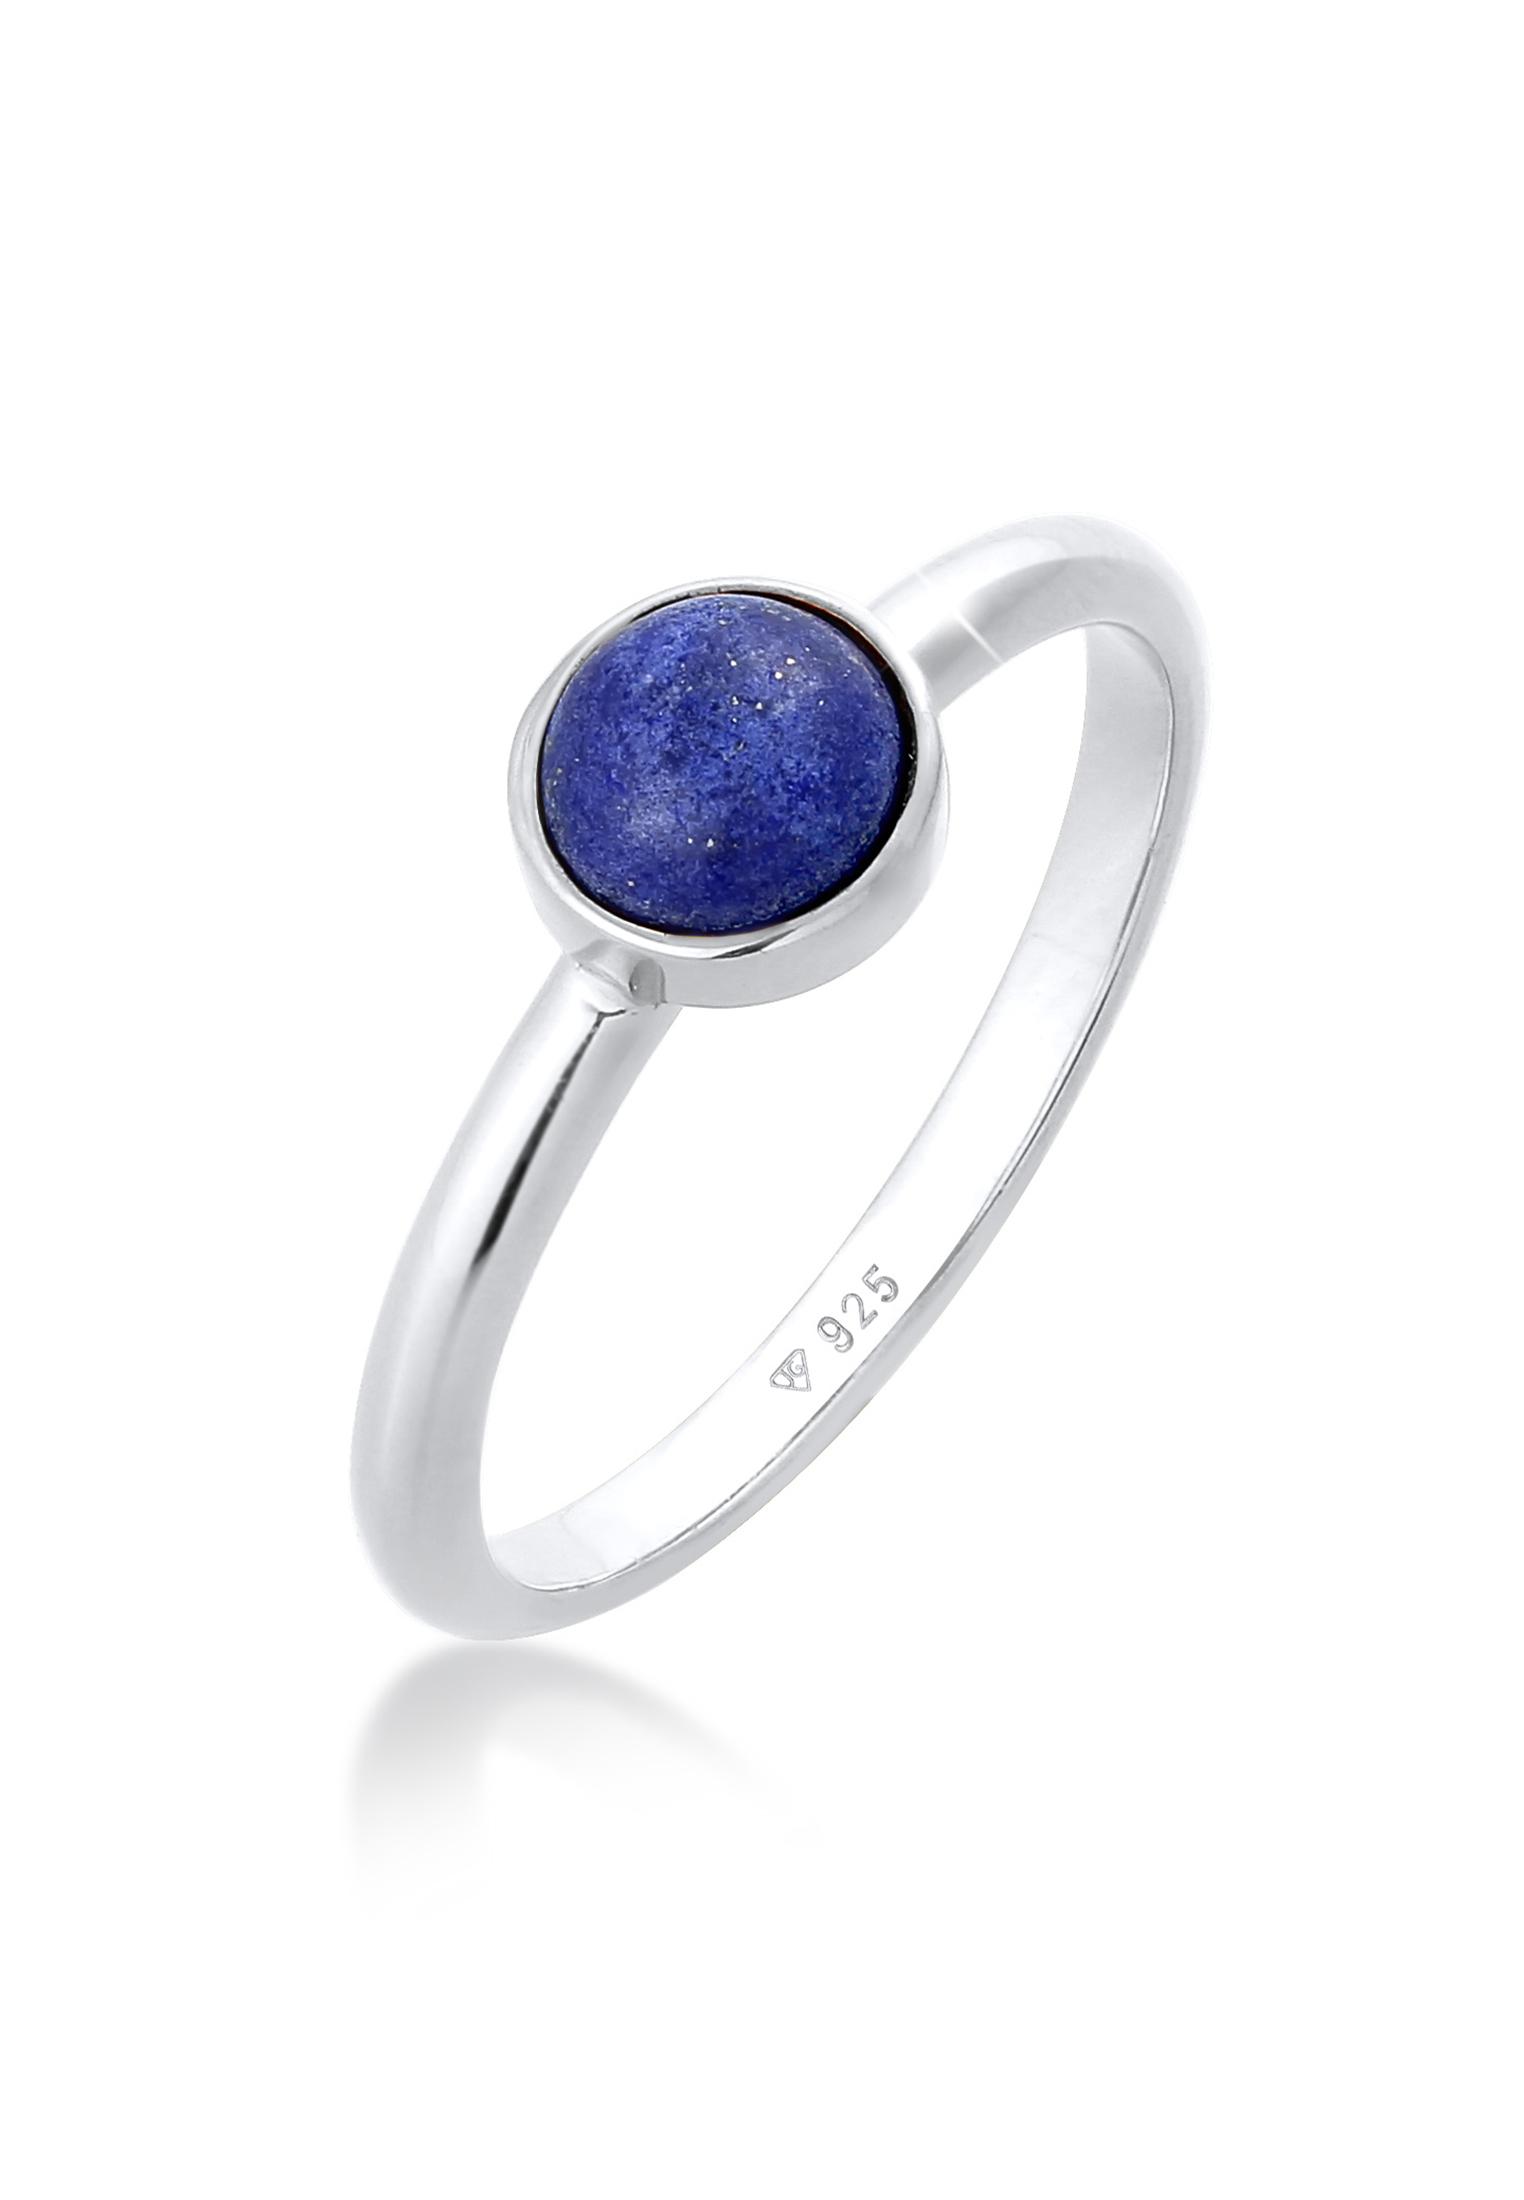 Solitär-Ring | Lapis Lazuli (Blau) | 925er Sterling Silber